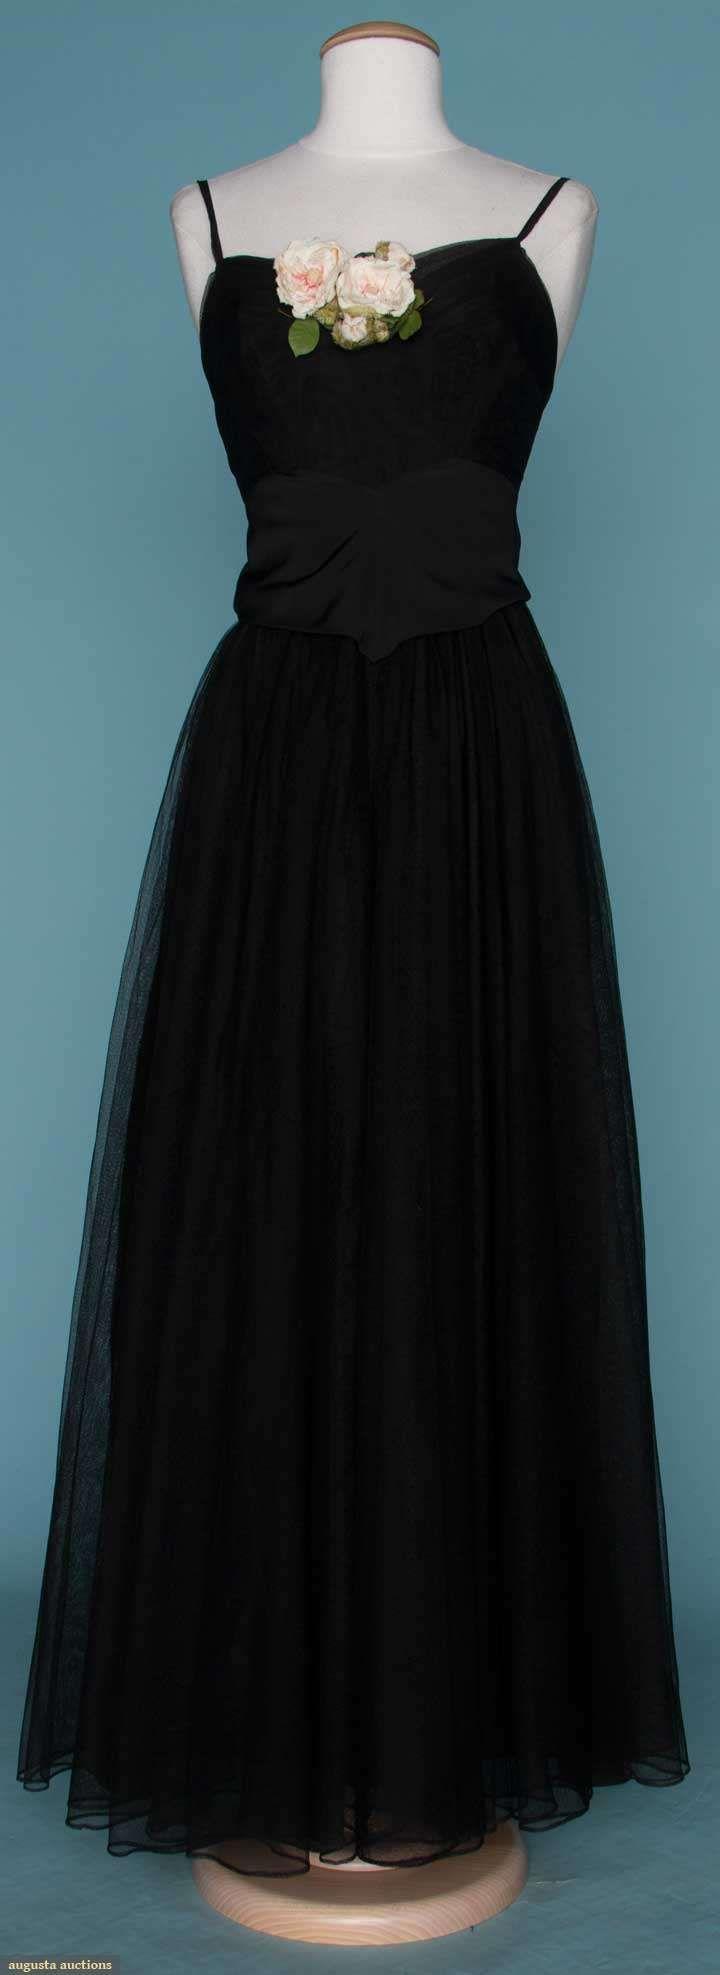 best past fashions images on pinterest beautiful black silk